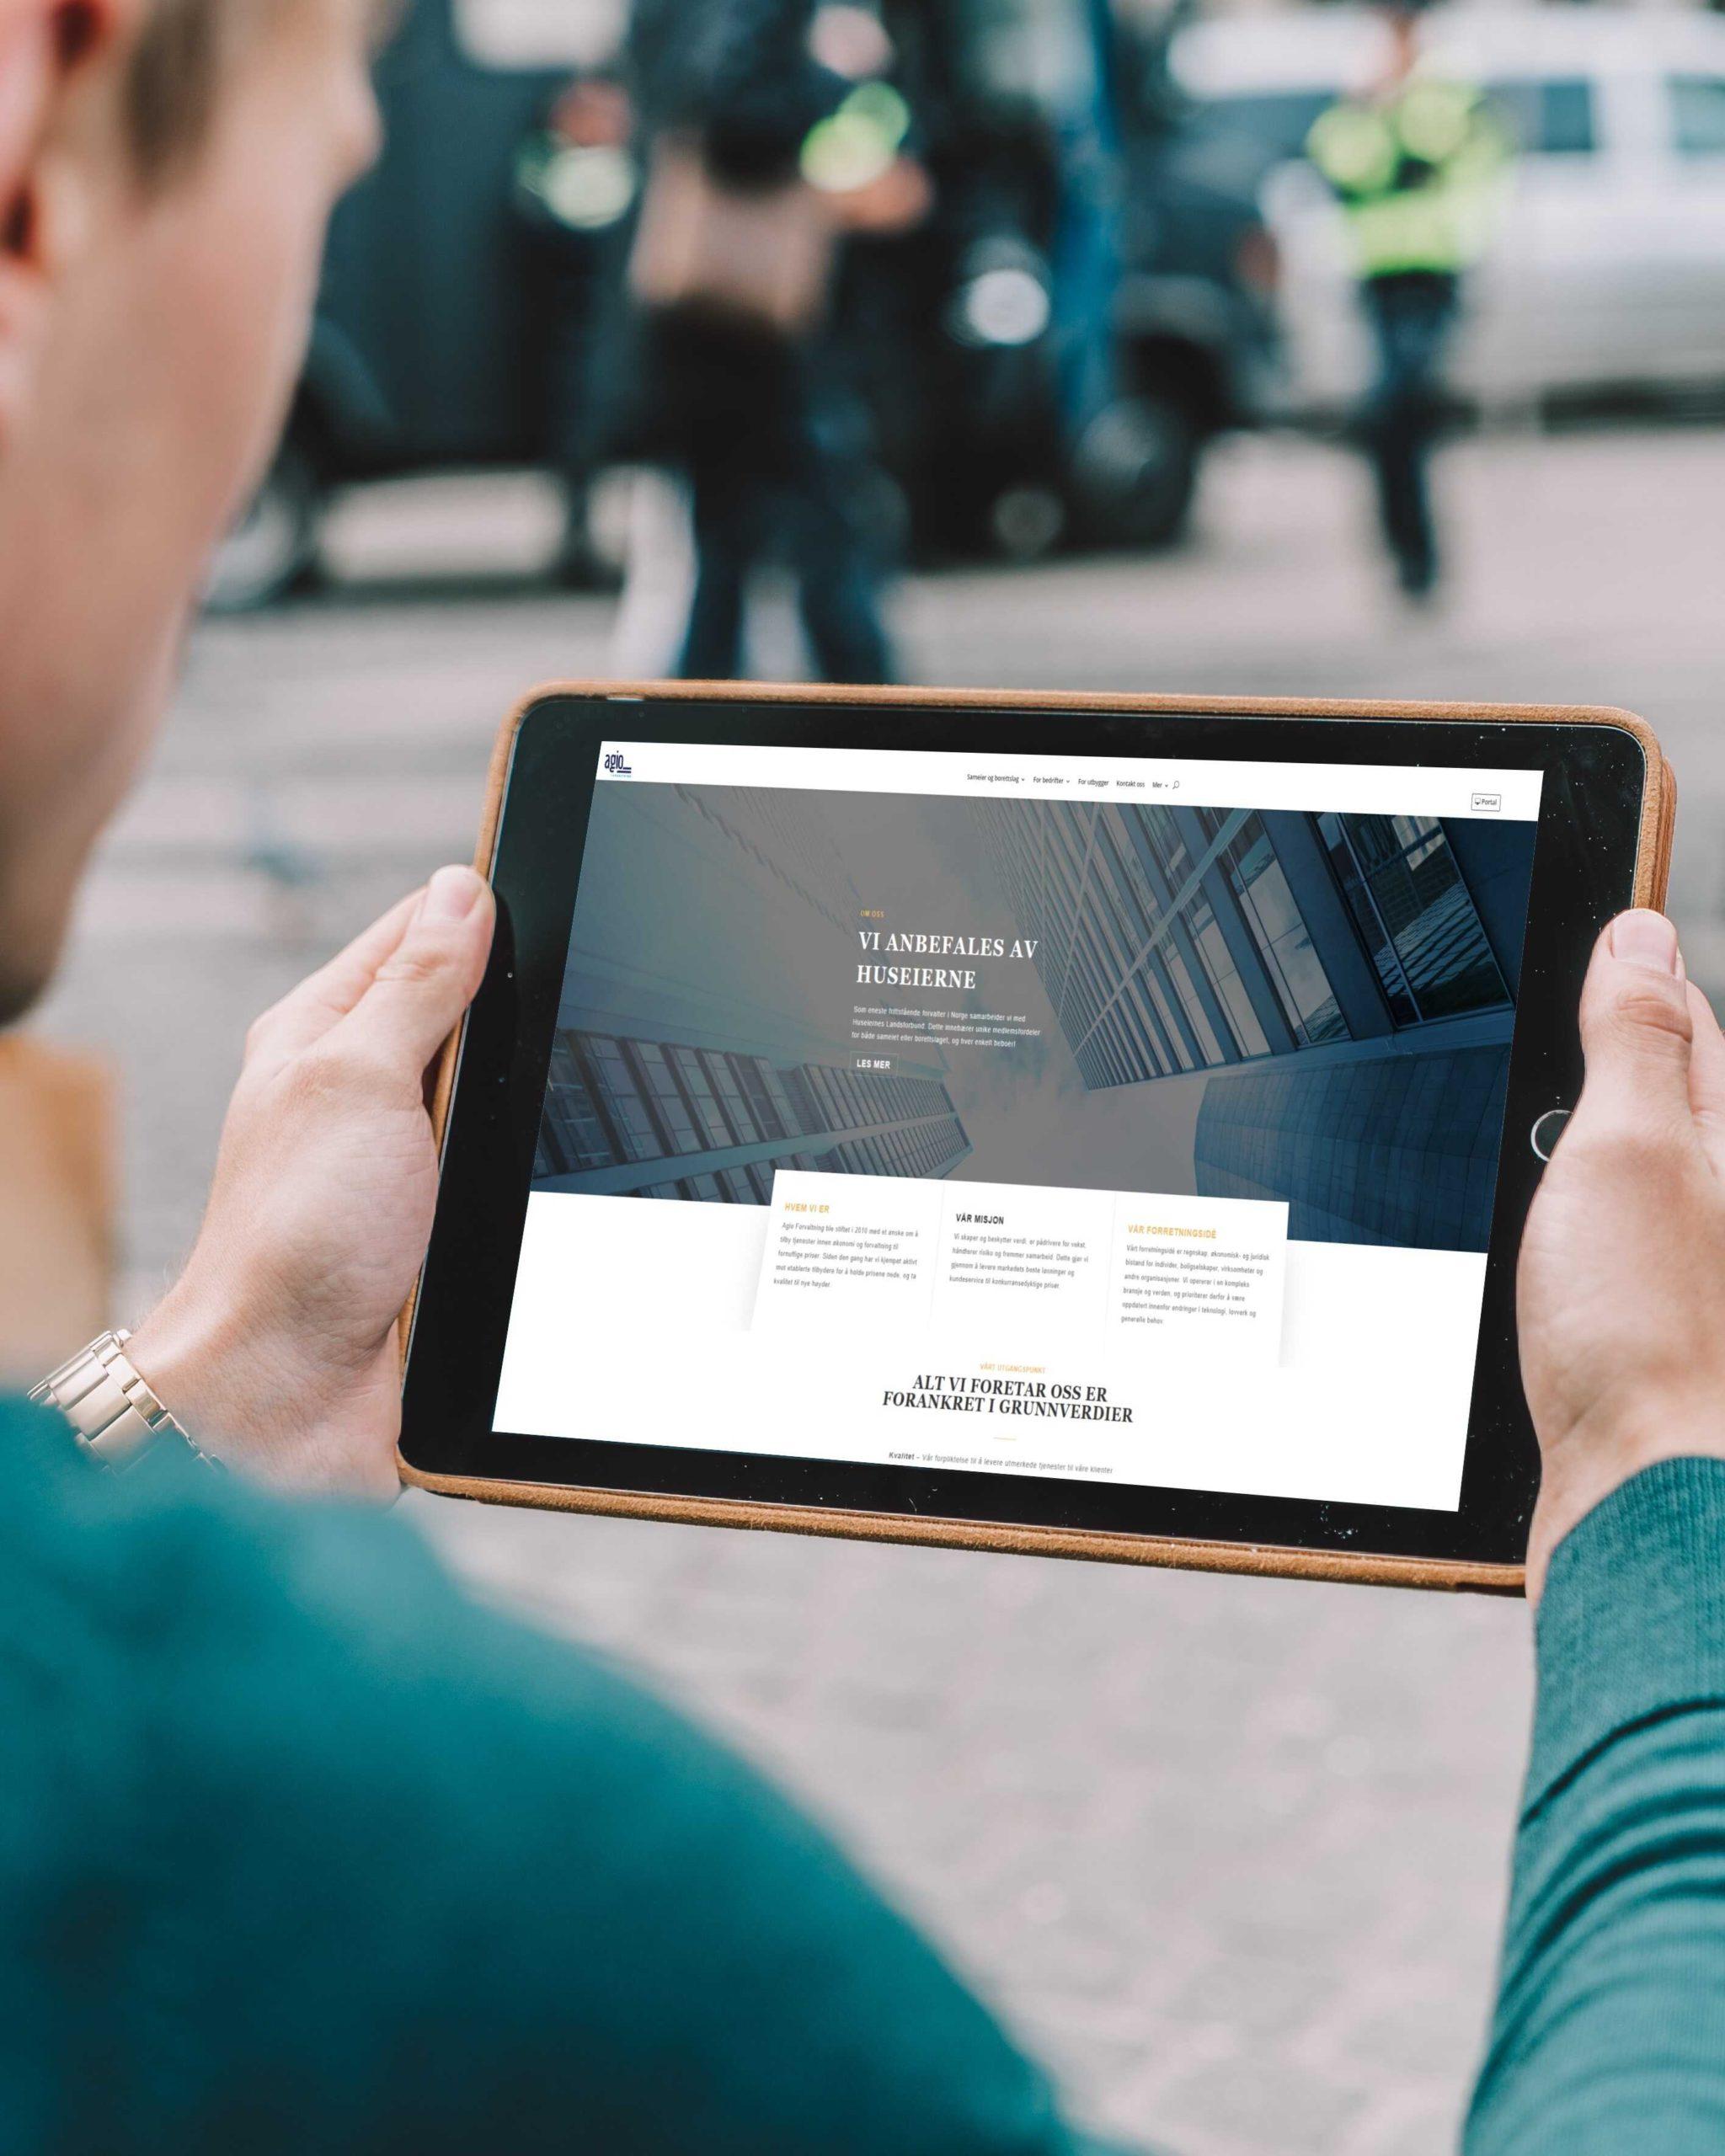 ipad med Agio Forvaltning sin nettside oppe